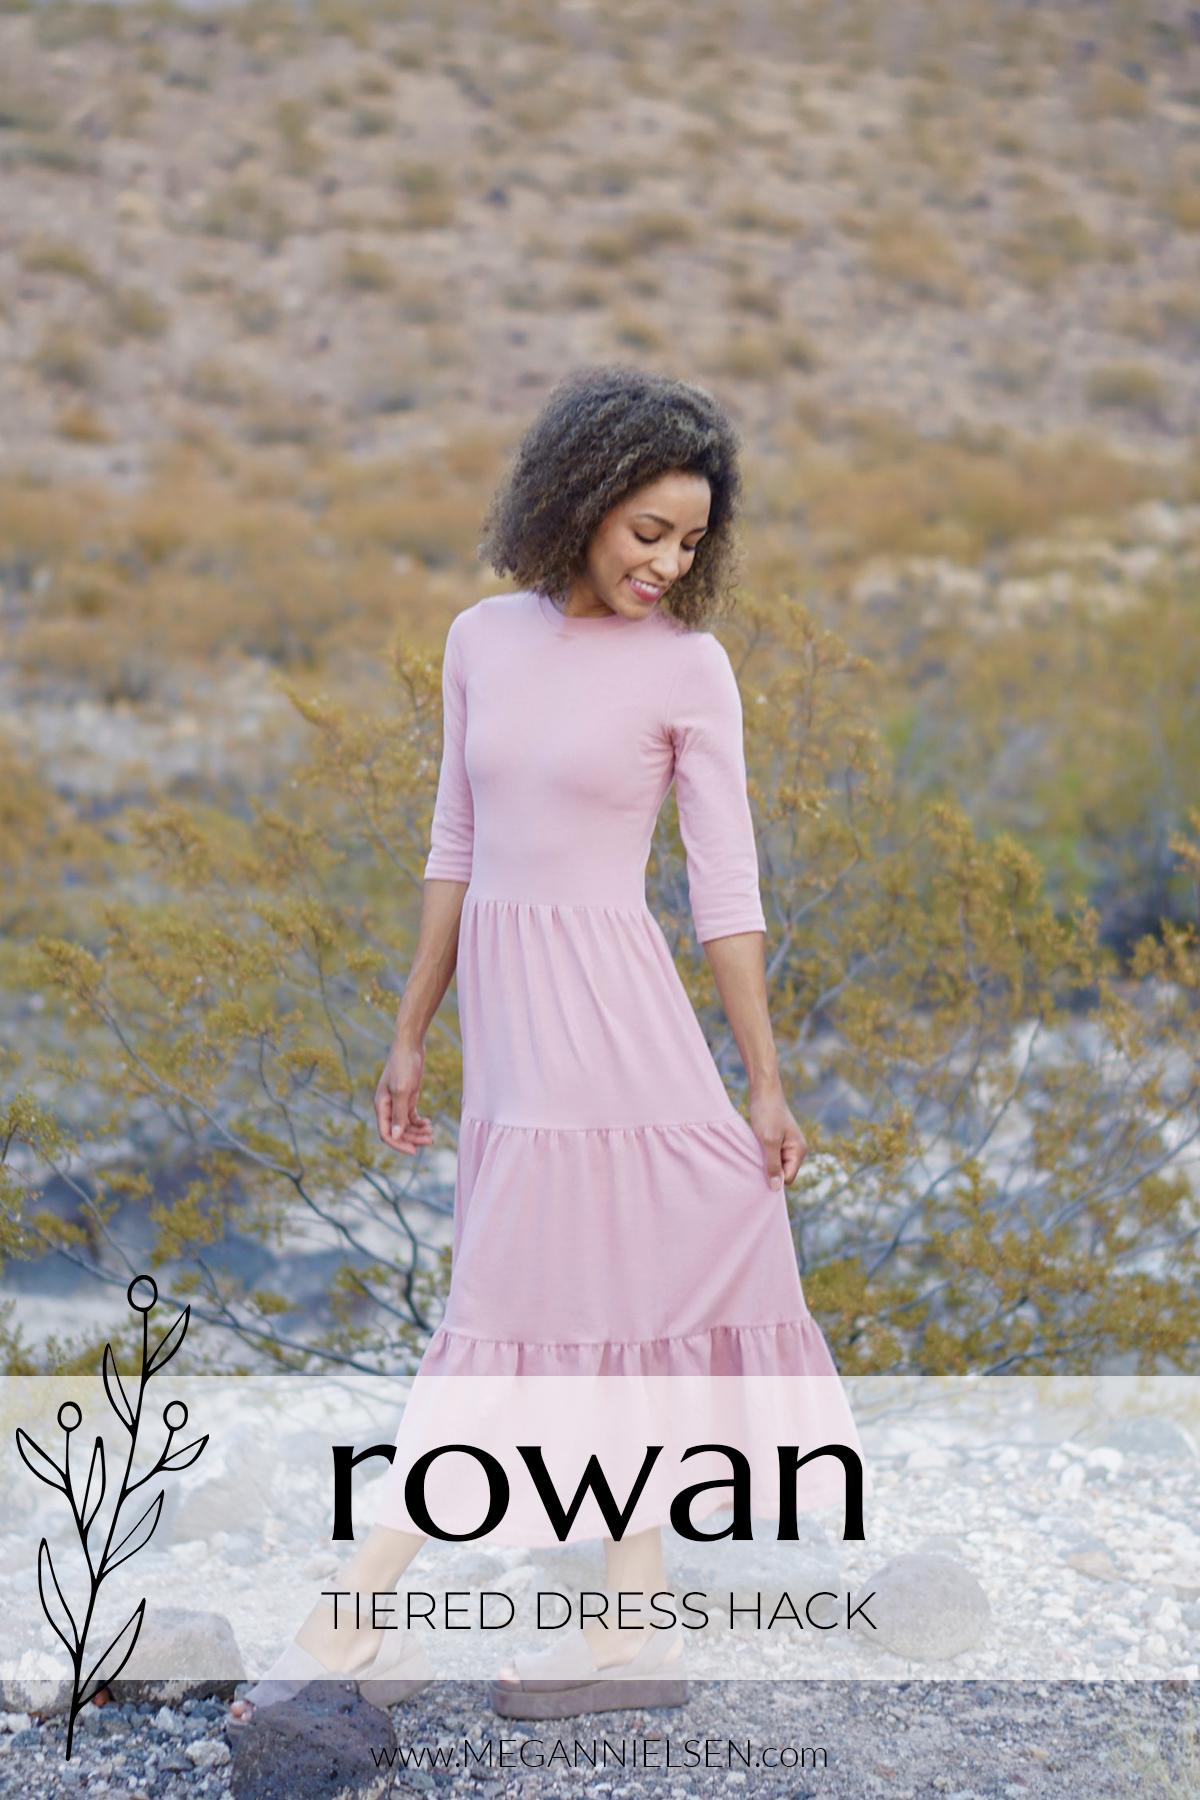 How to make Rowan as a tiered dress